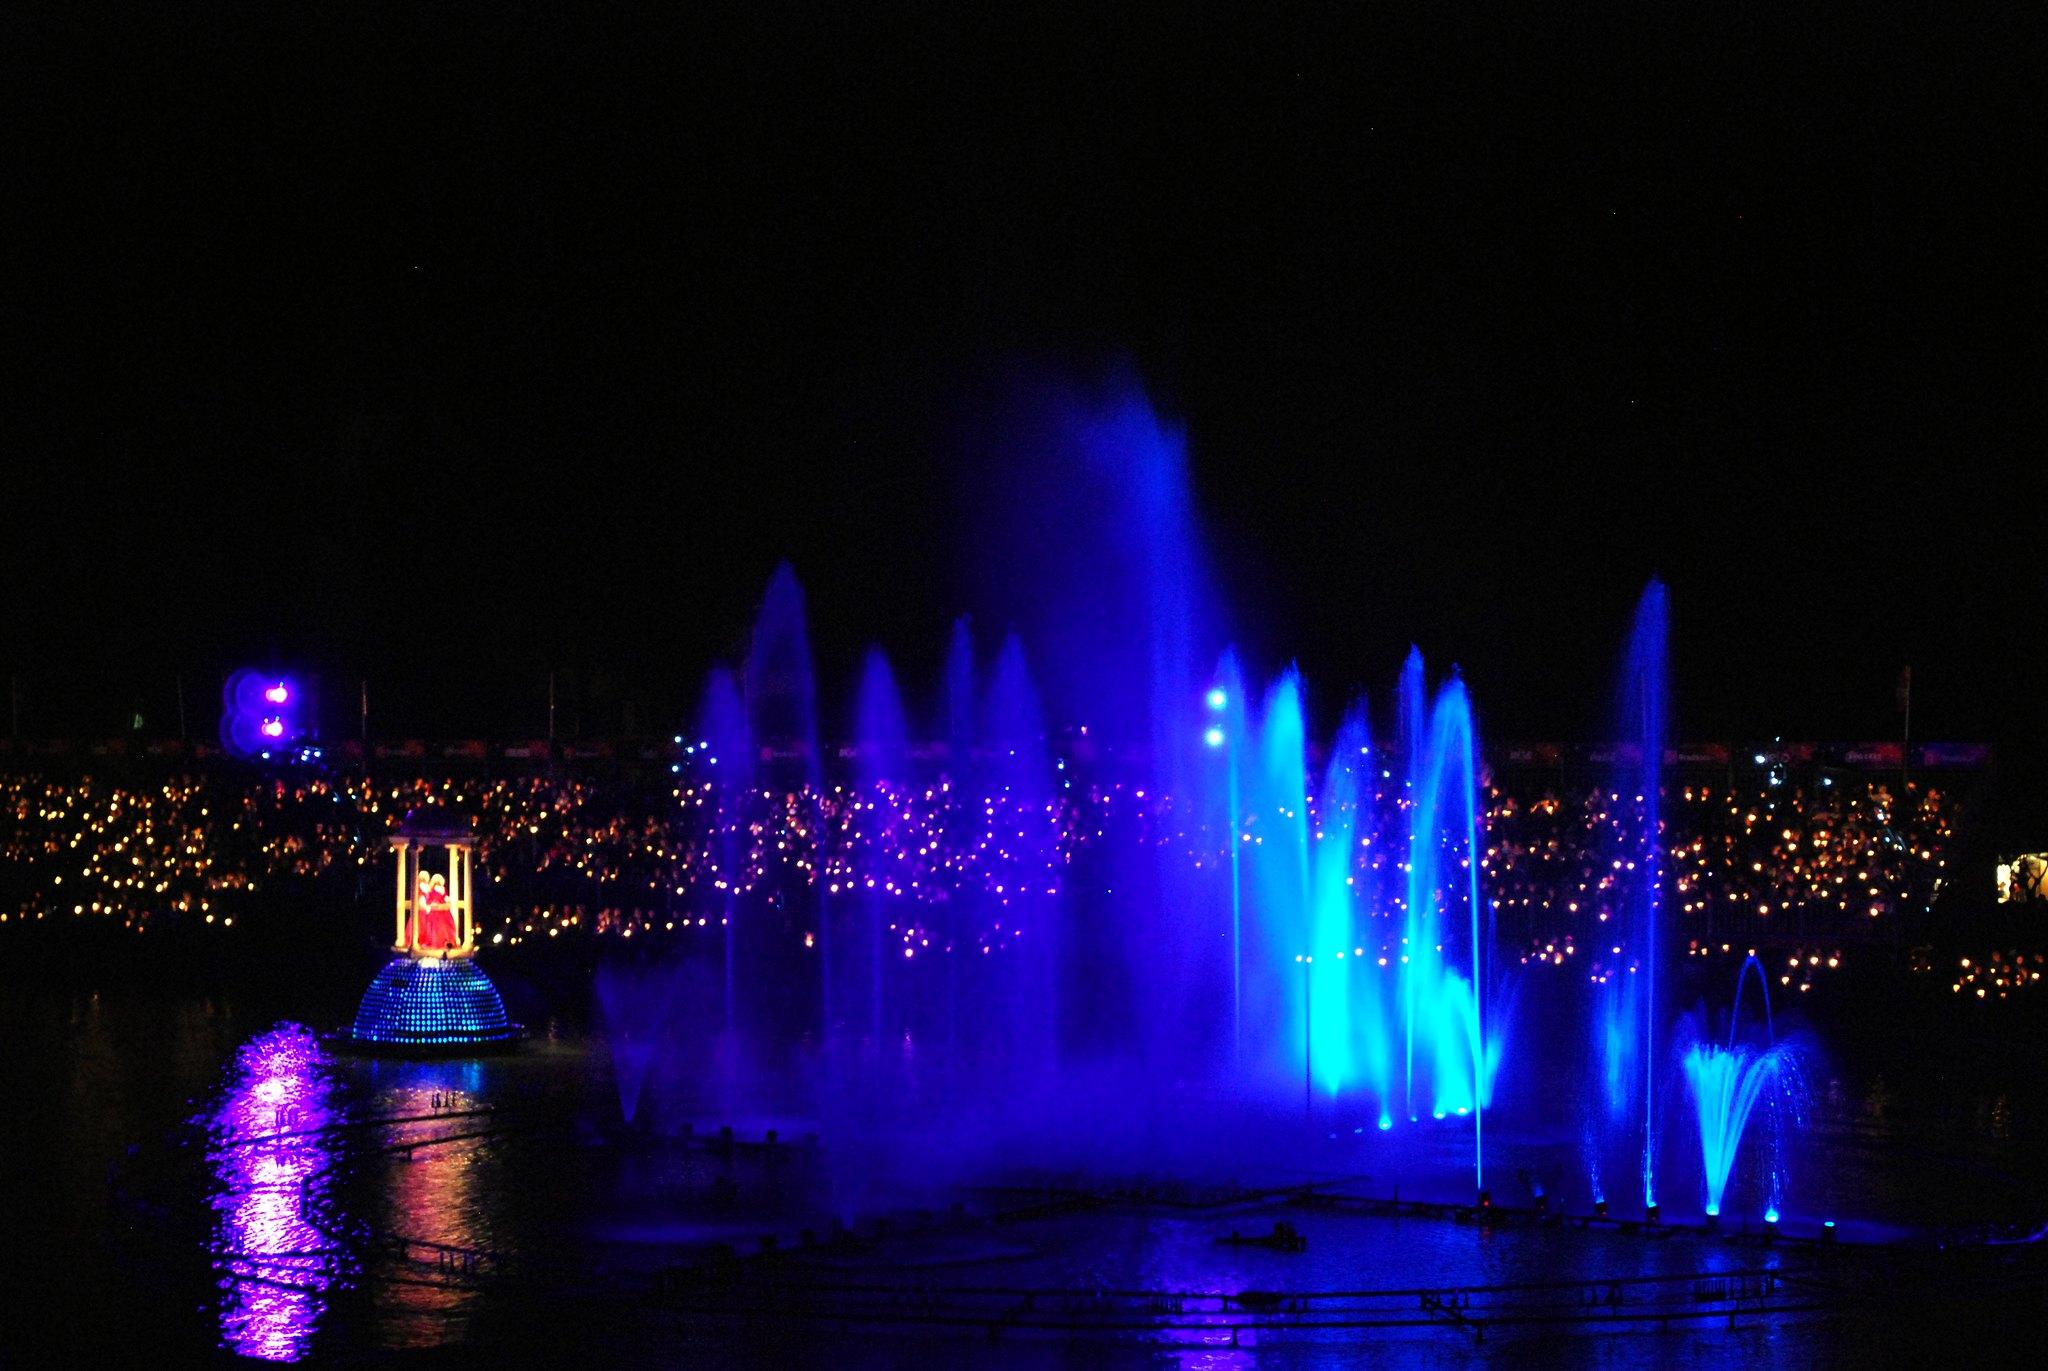 show de fogos no lago illumination